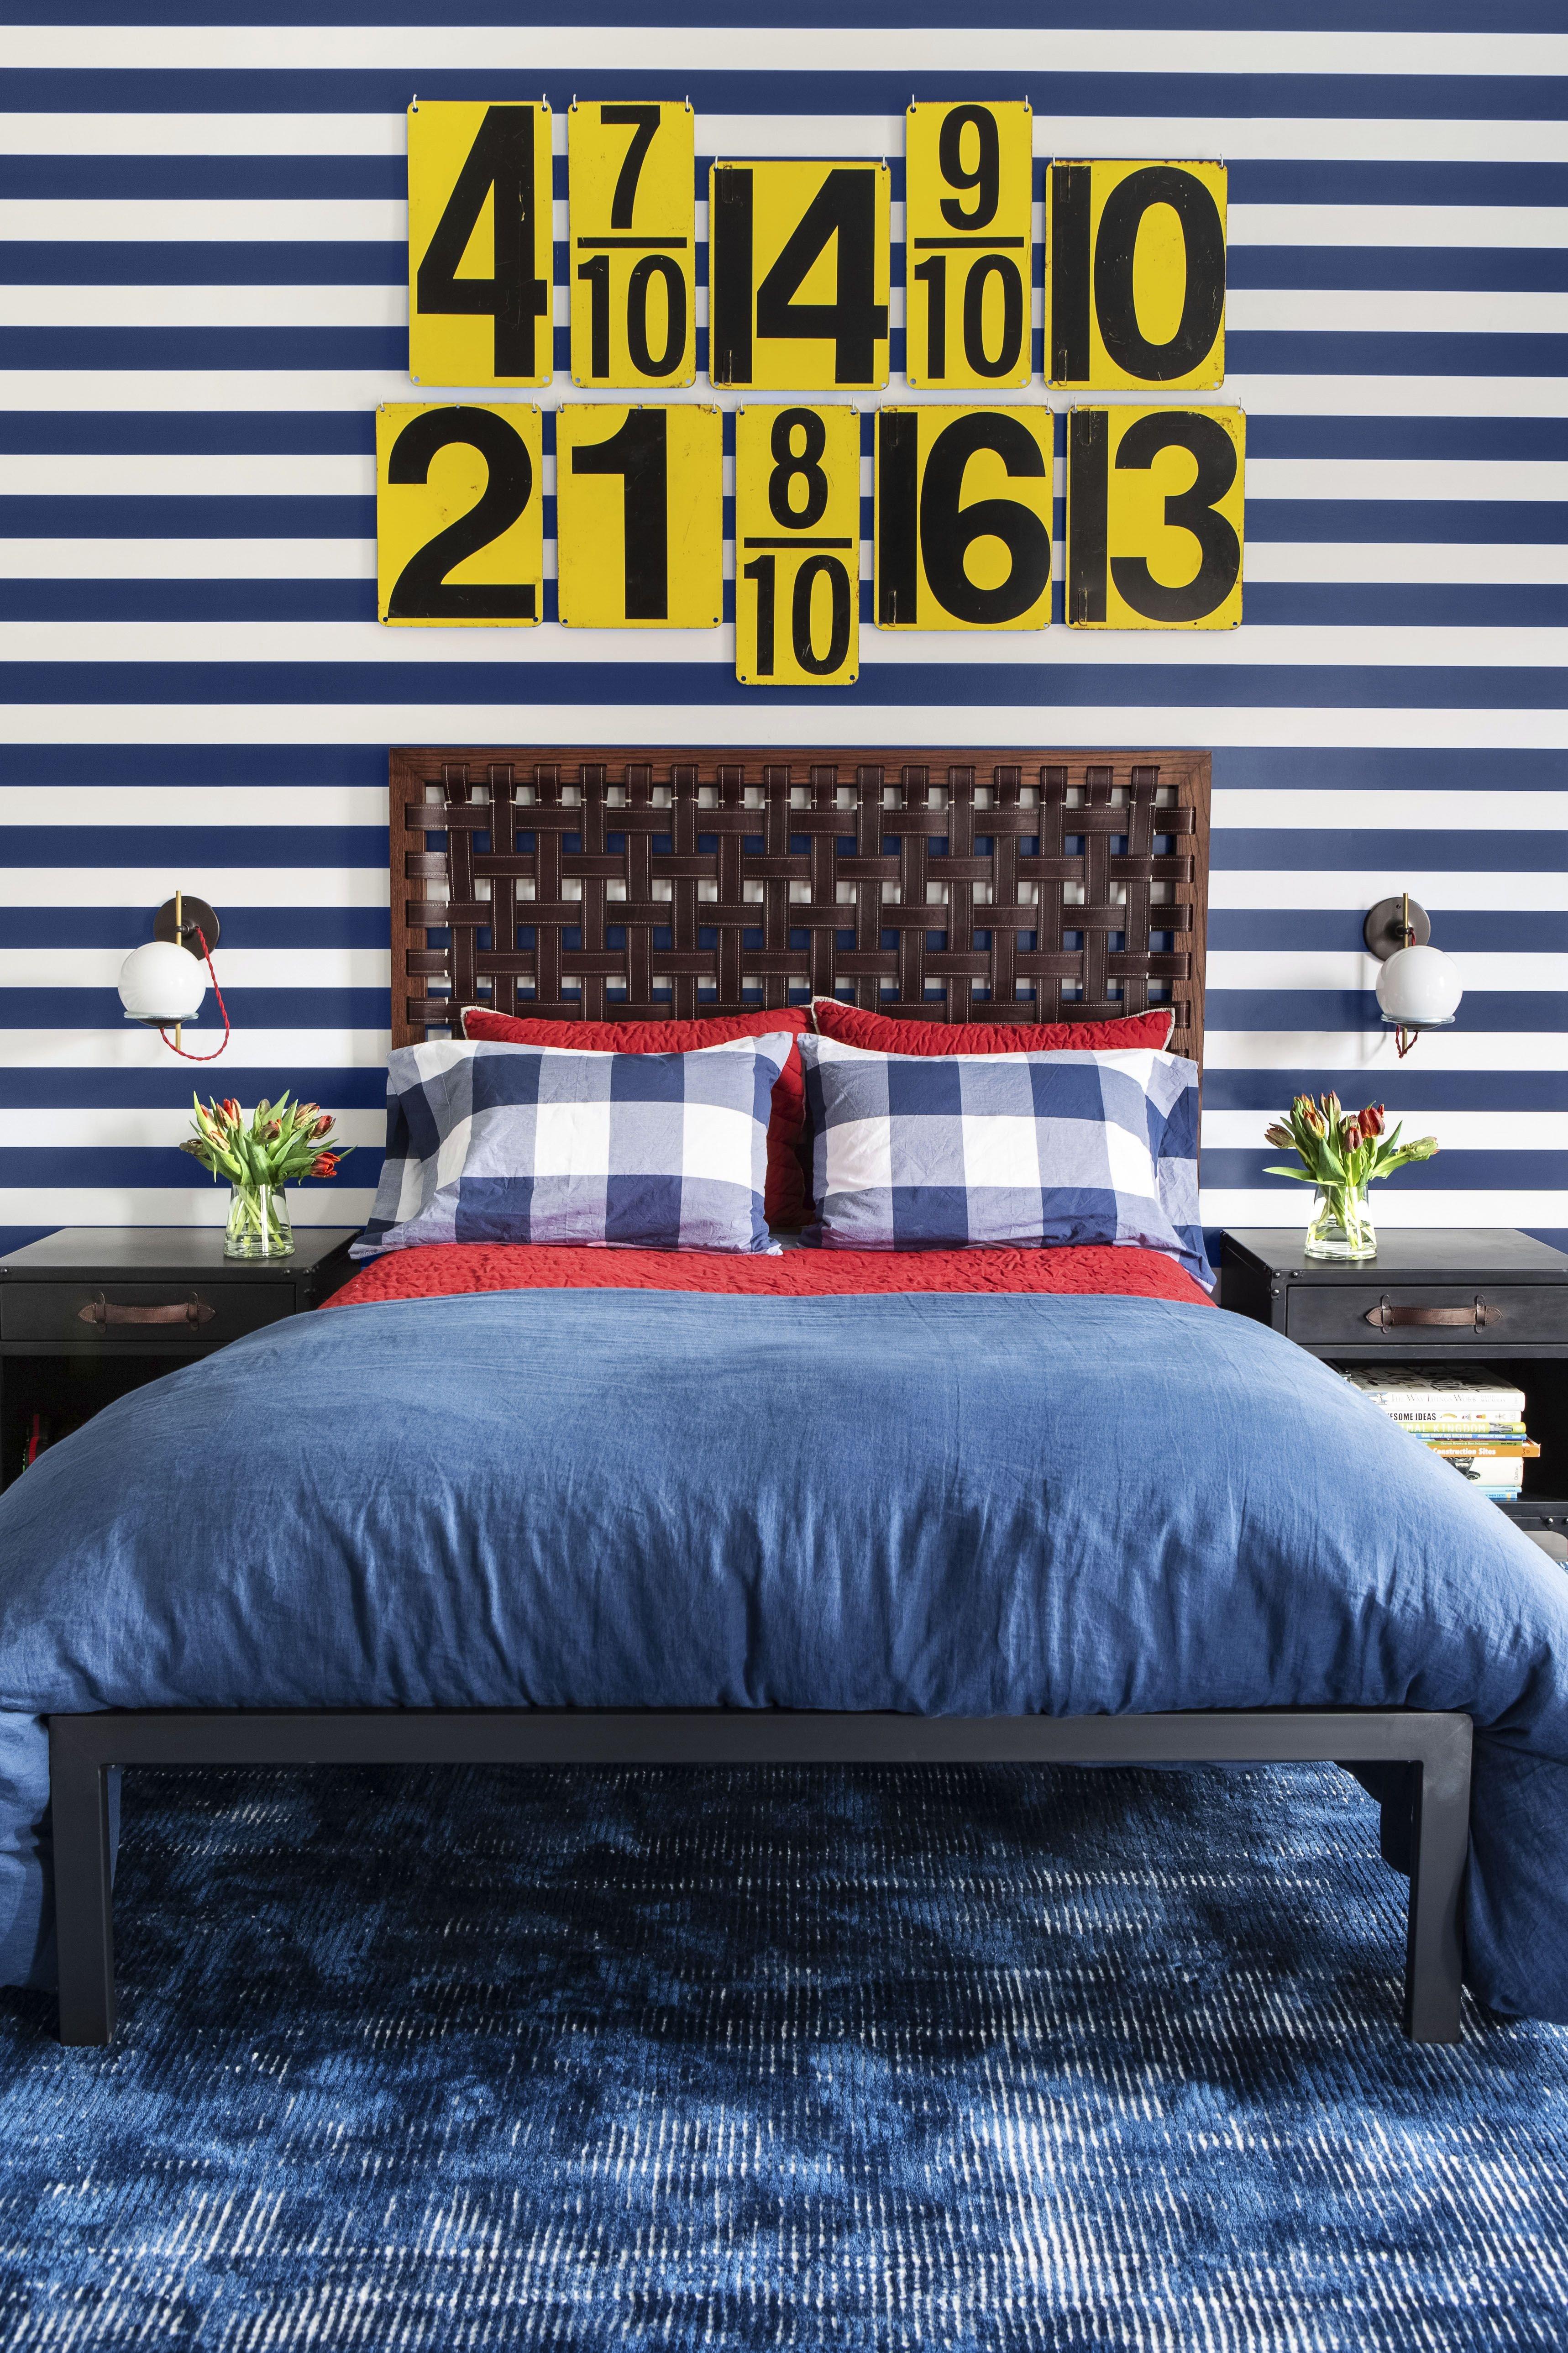 10 Year Old Boy Bedroom Ideas Elegant 30 Best Kids Room Ideas Diy Boys and Girls Bedroom